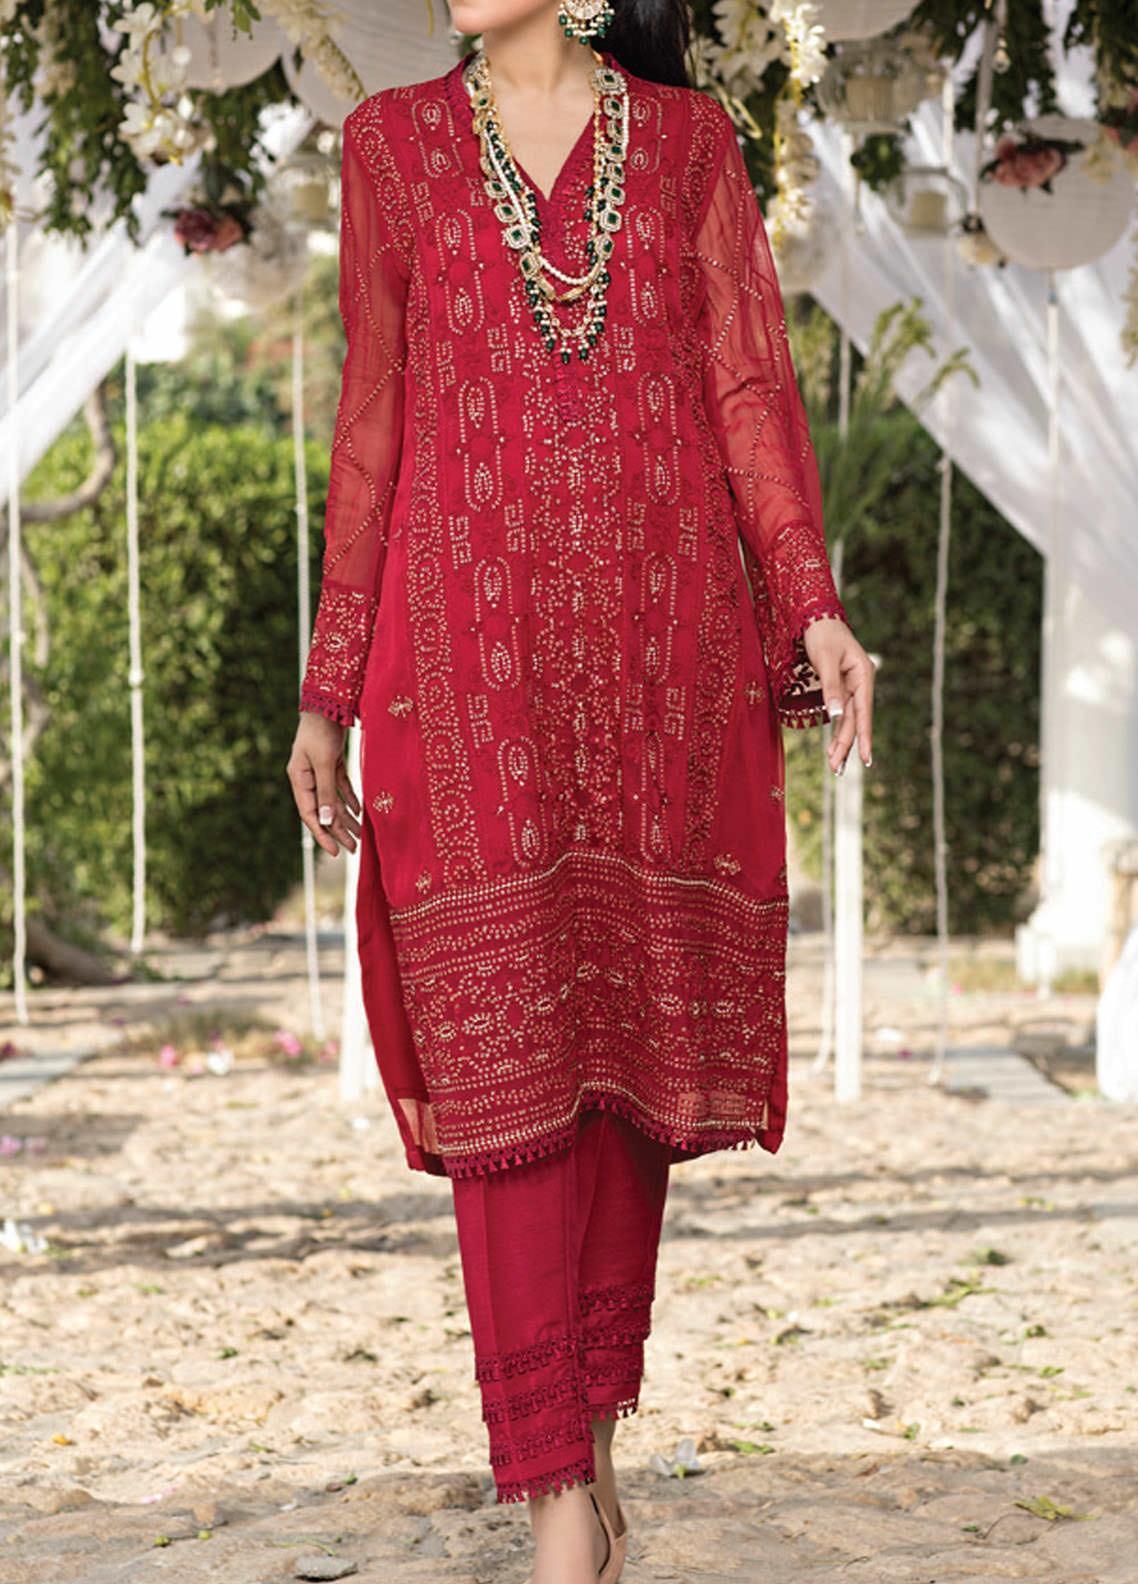 Azure Embroidered Chiffon Unstitched Kurties AZU20-LF3 01 Glittery Red - Luxury Formal Collection